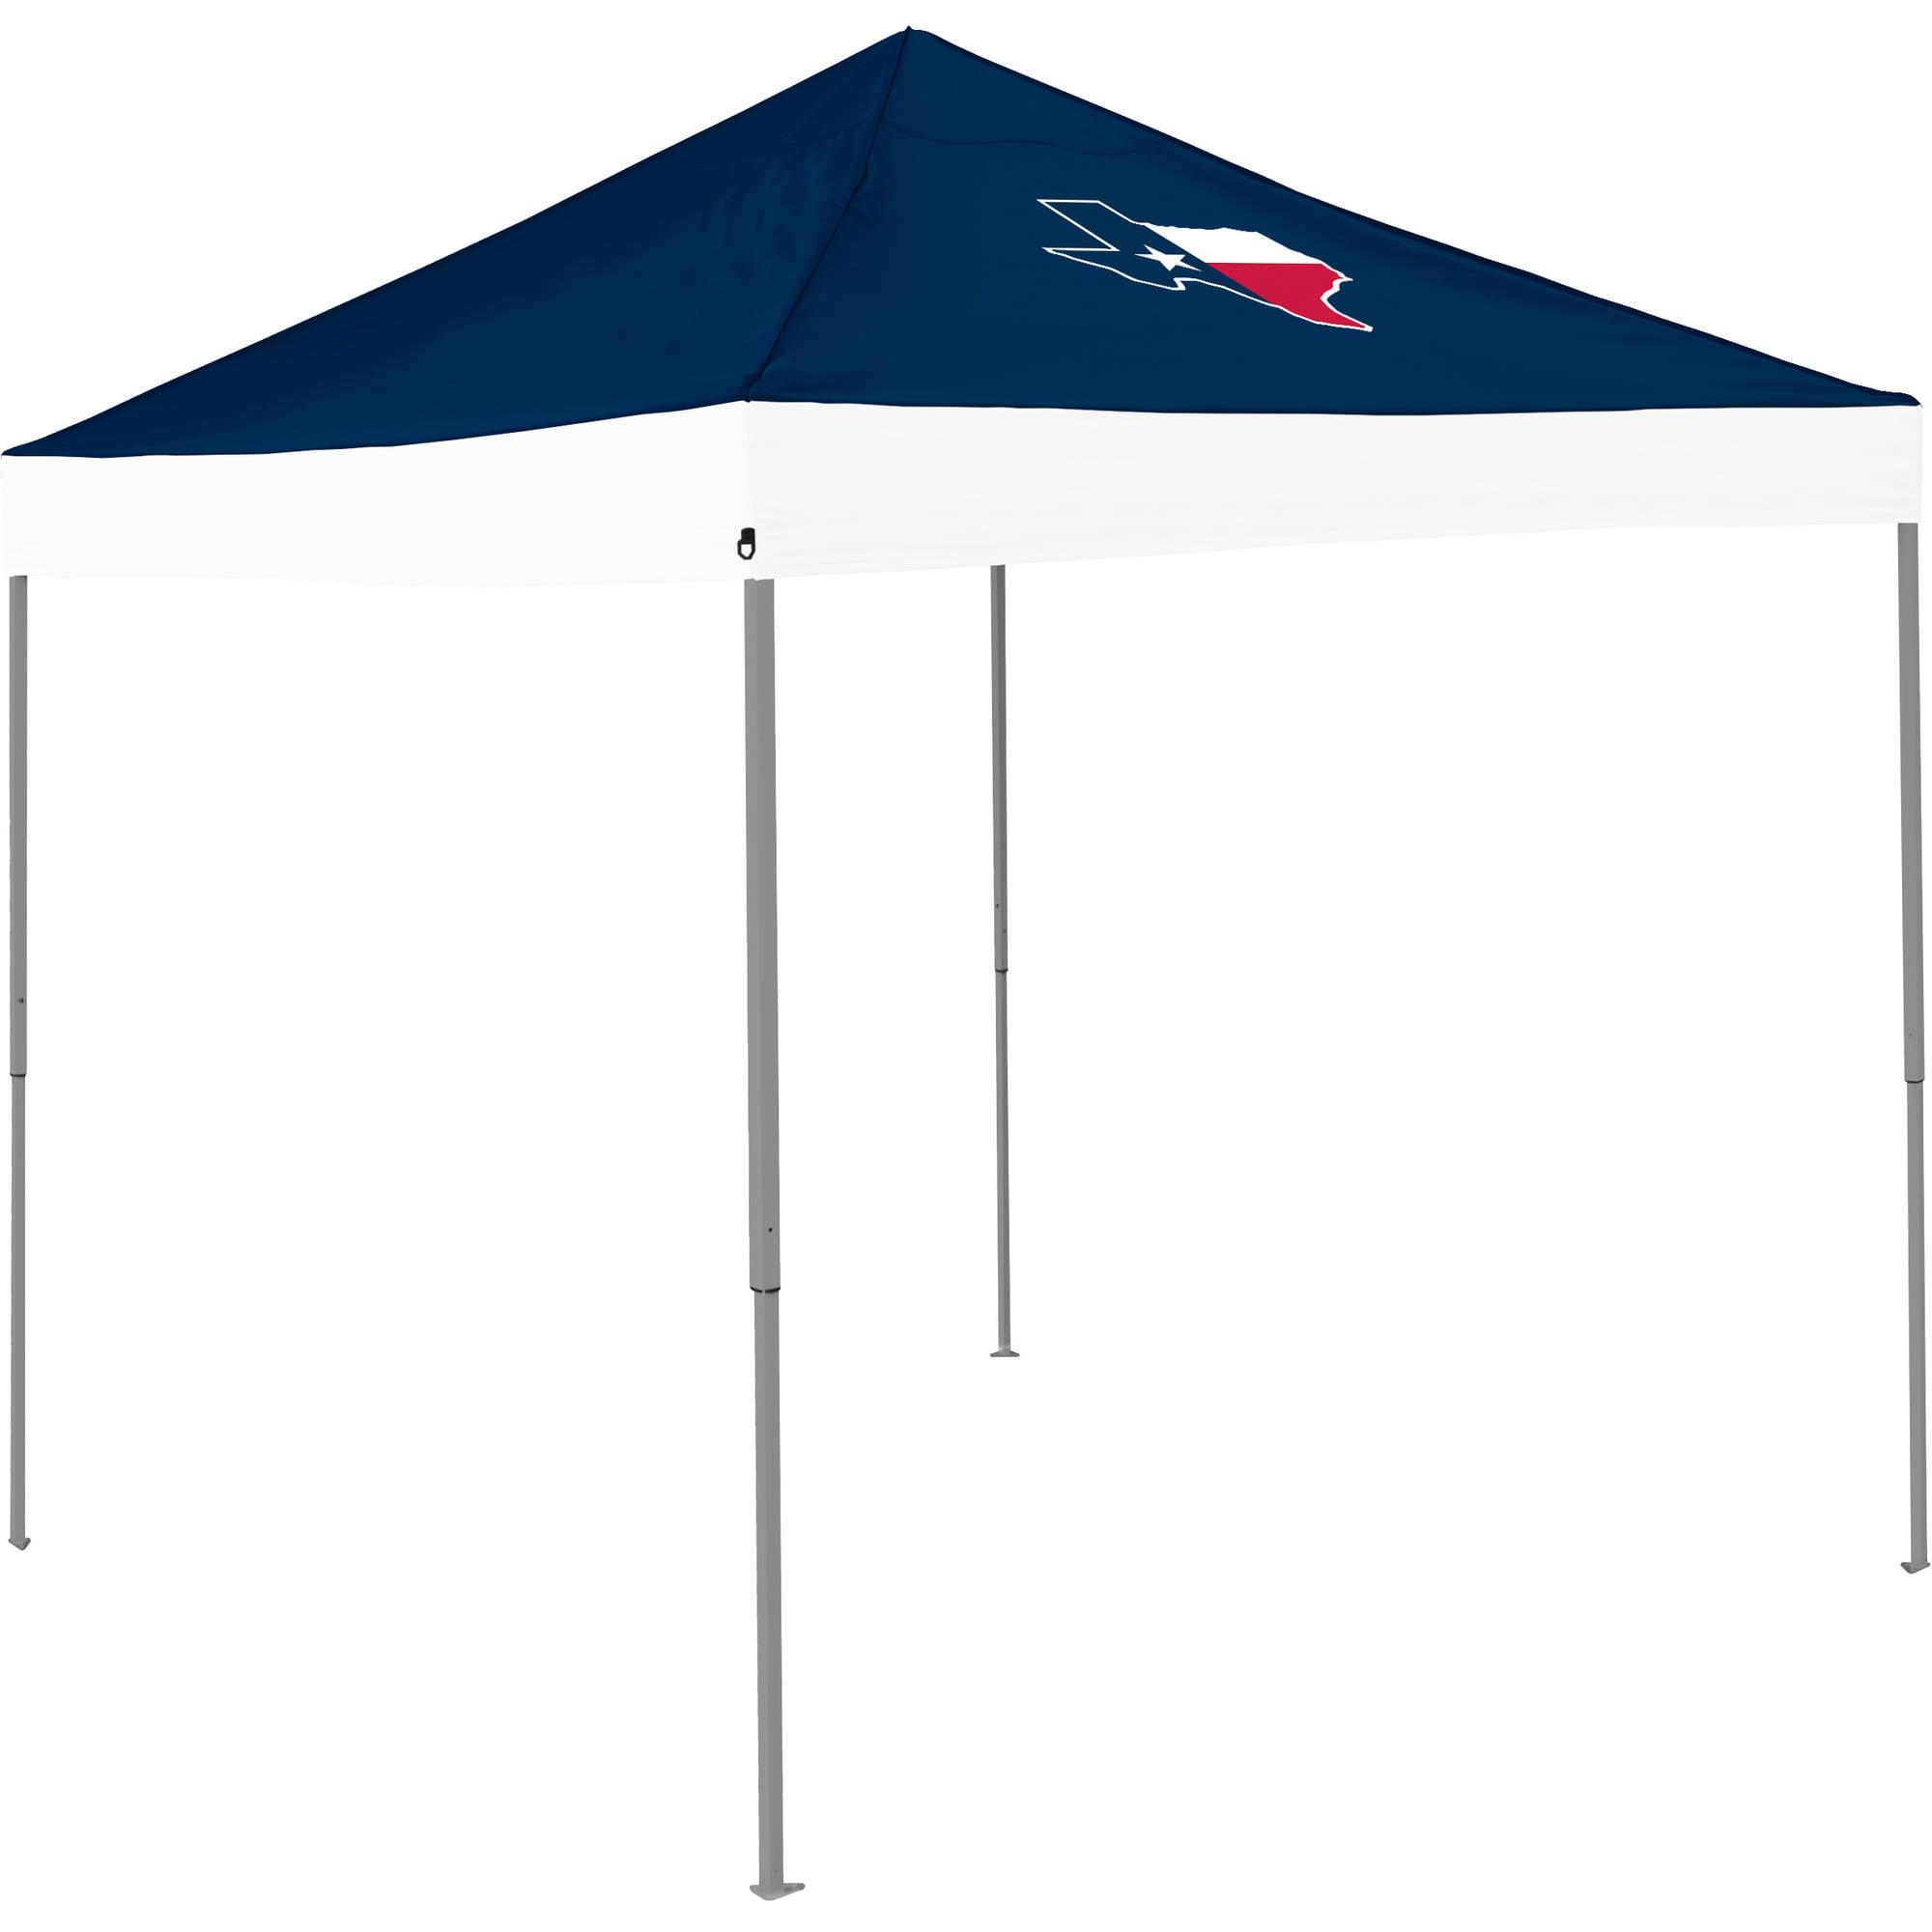 State of Texas Flag 9u0027 x 9u0027 Shelter  sc 1 st  BrickSeek & State of Texas Flag 9u0027 x 9u0027 Shelter u2013 Walmart Inventory Checker ...